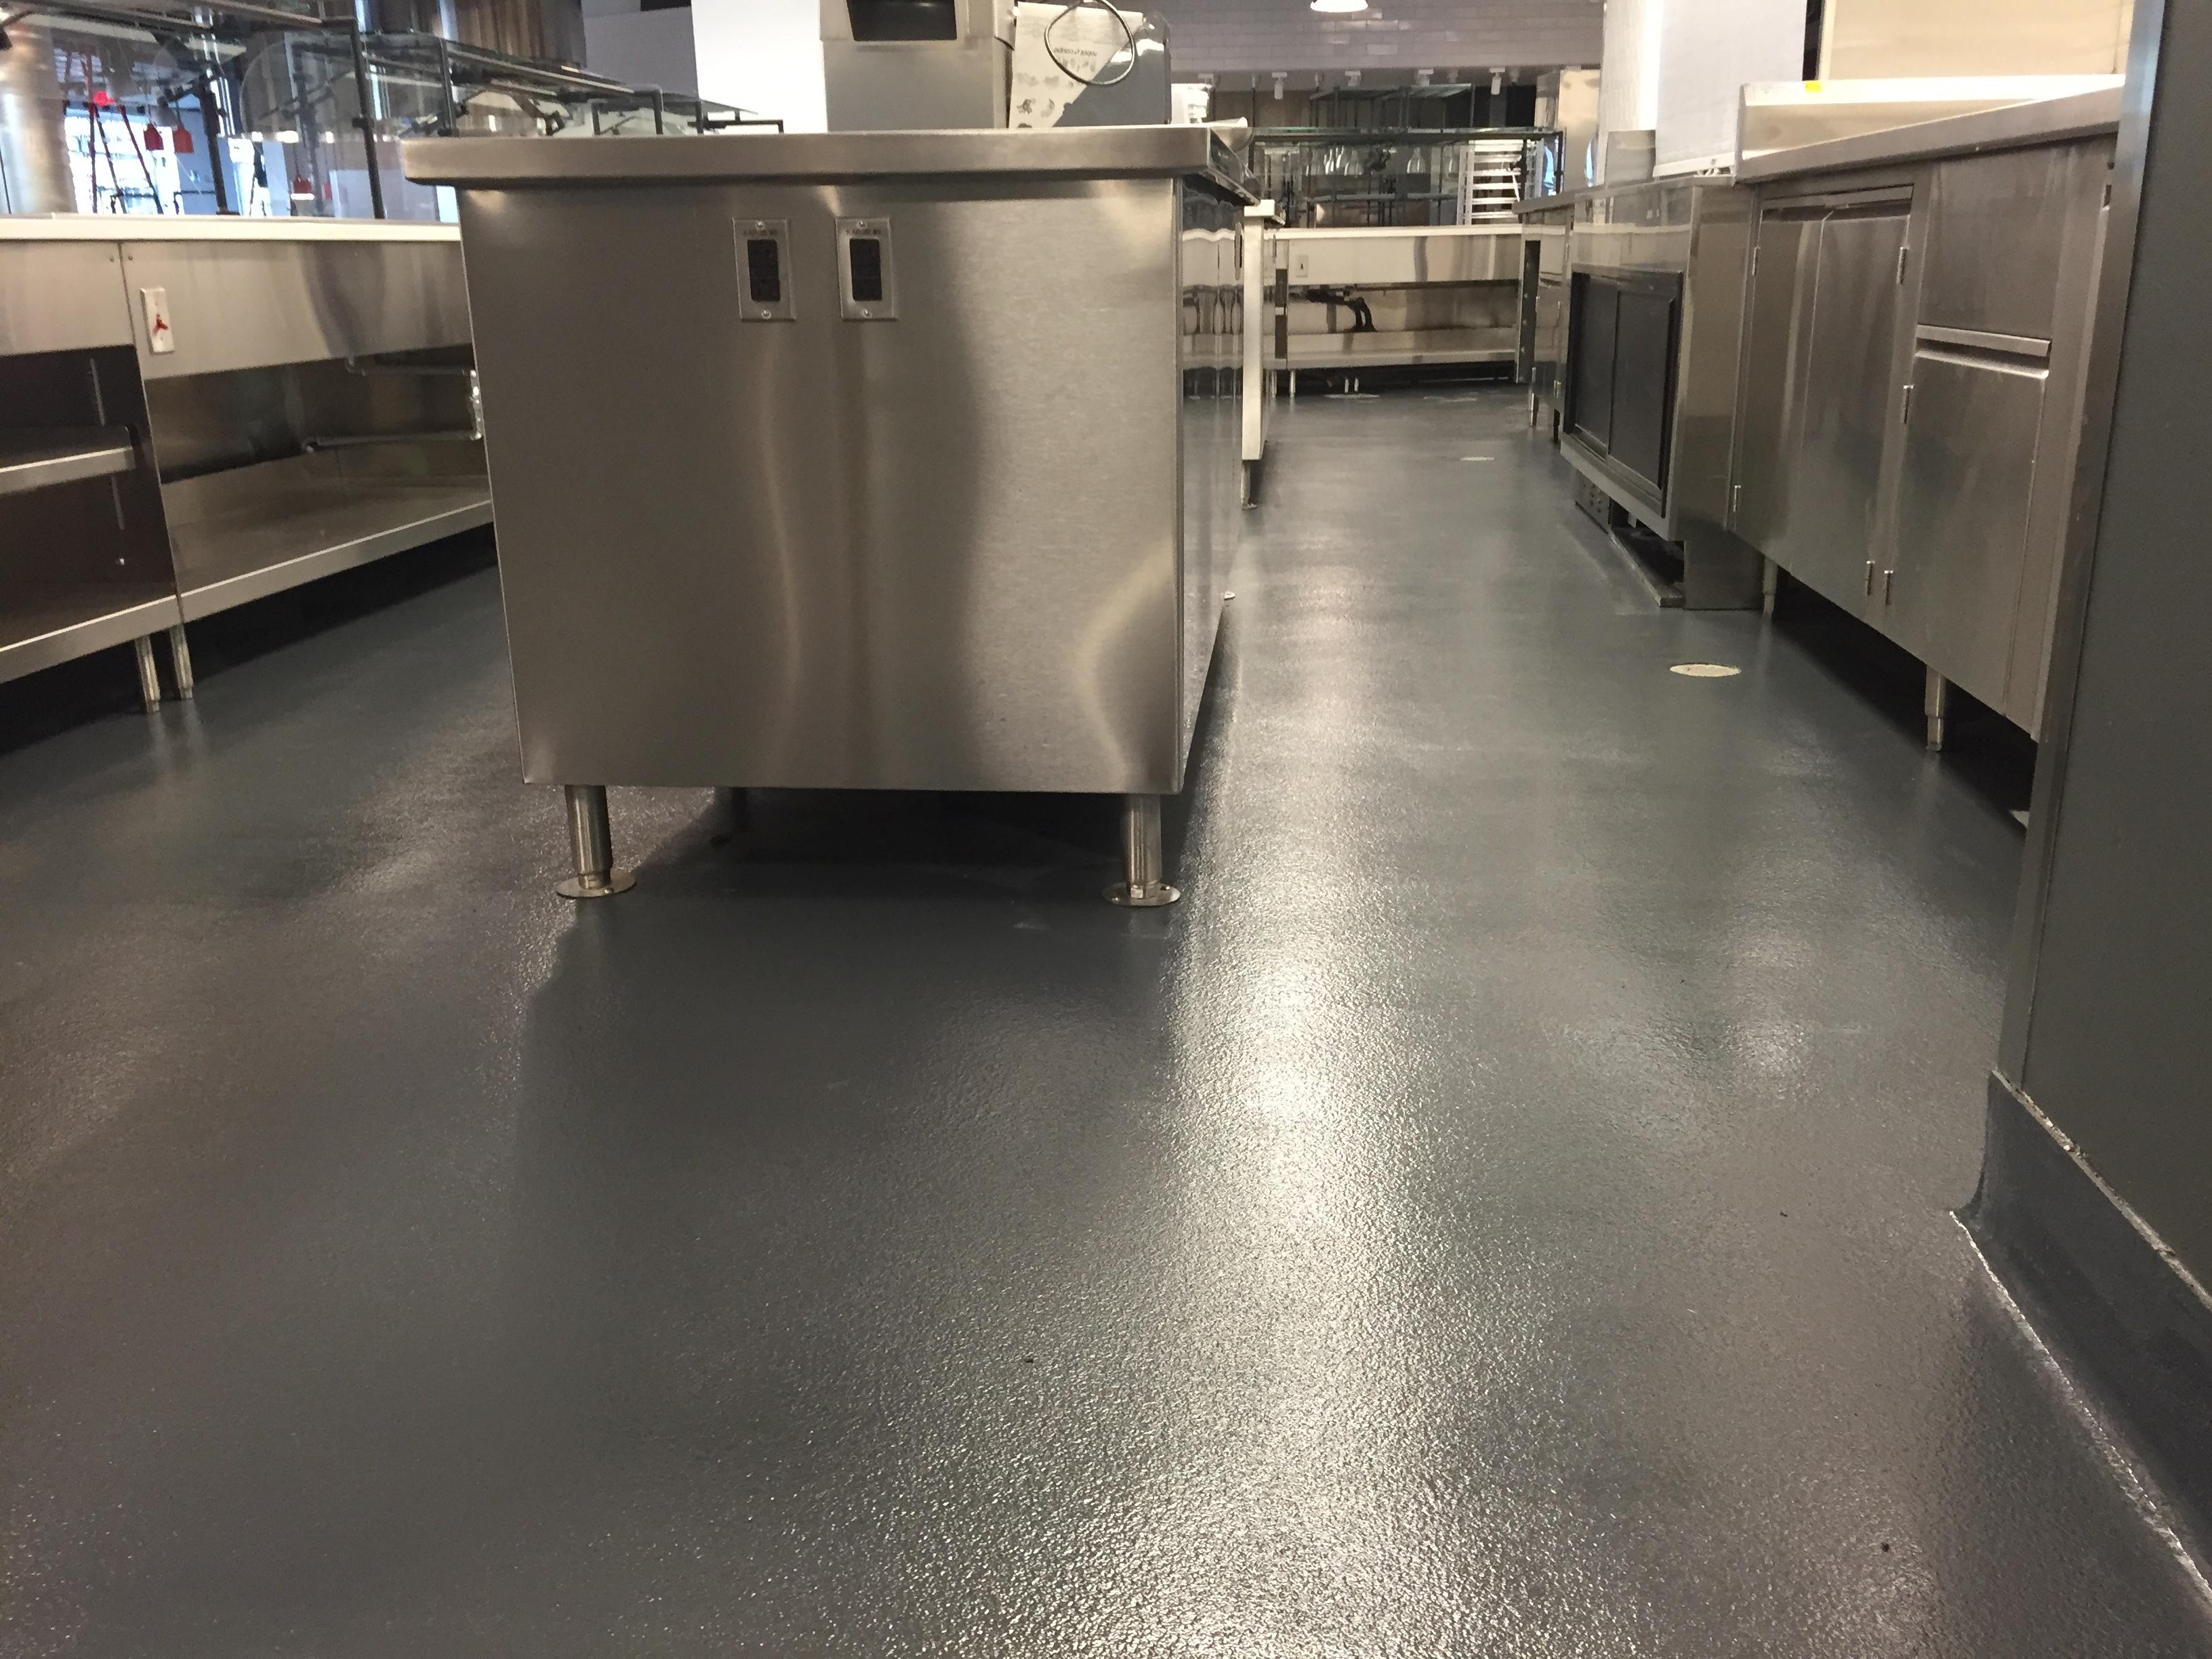 large university kitchen commercial kitchen flooring Urethane Mortar Flooring Urethane Mortar Flooring Urethane Mortar Flooring Large University Kitchen